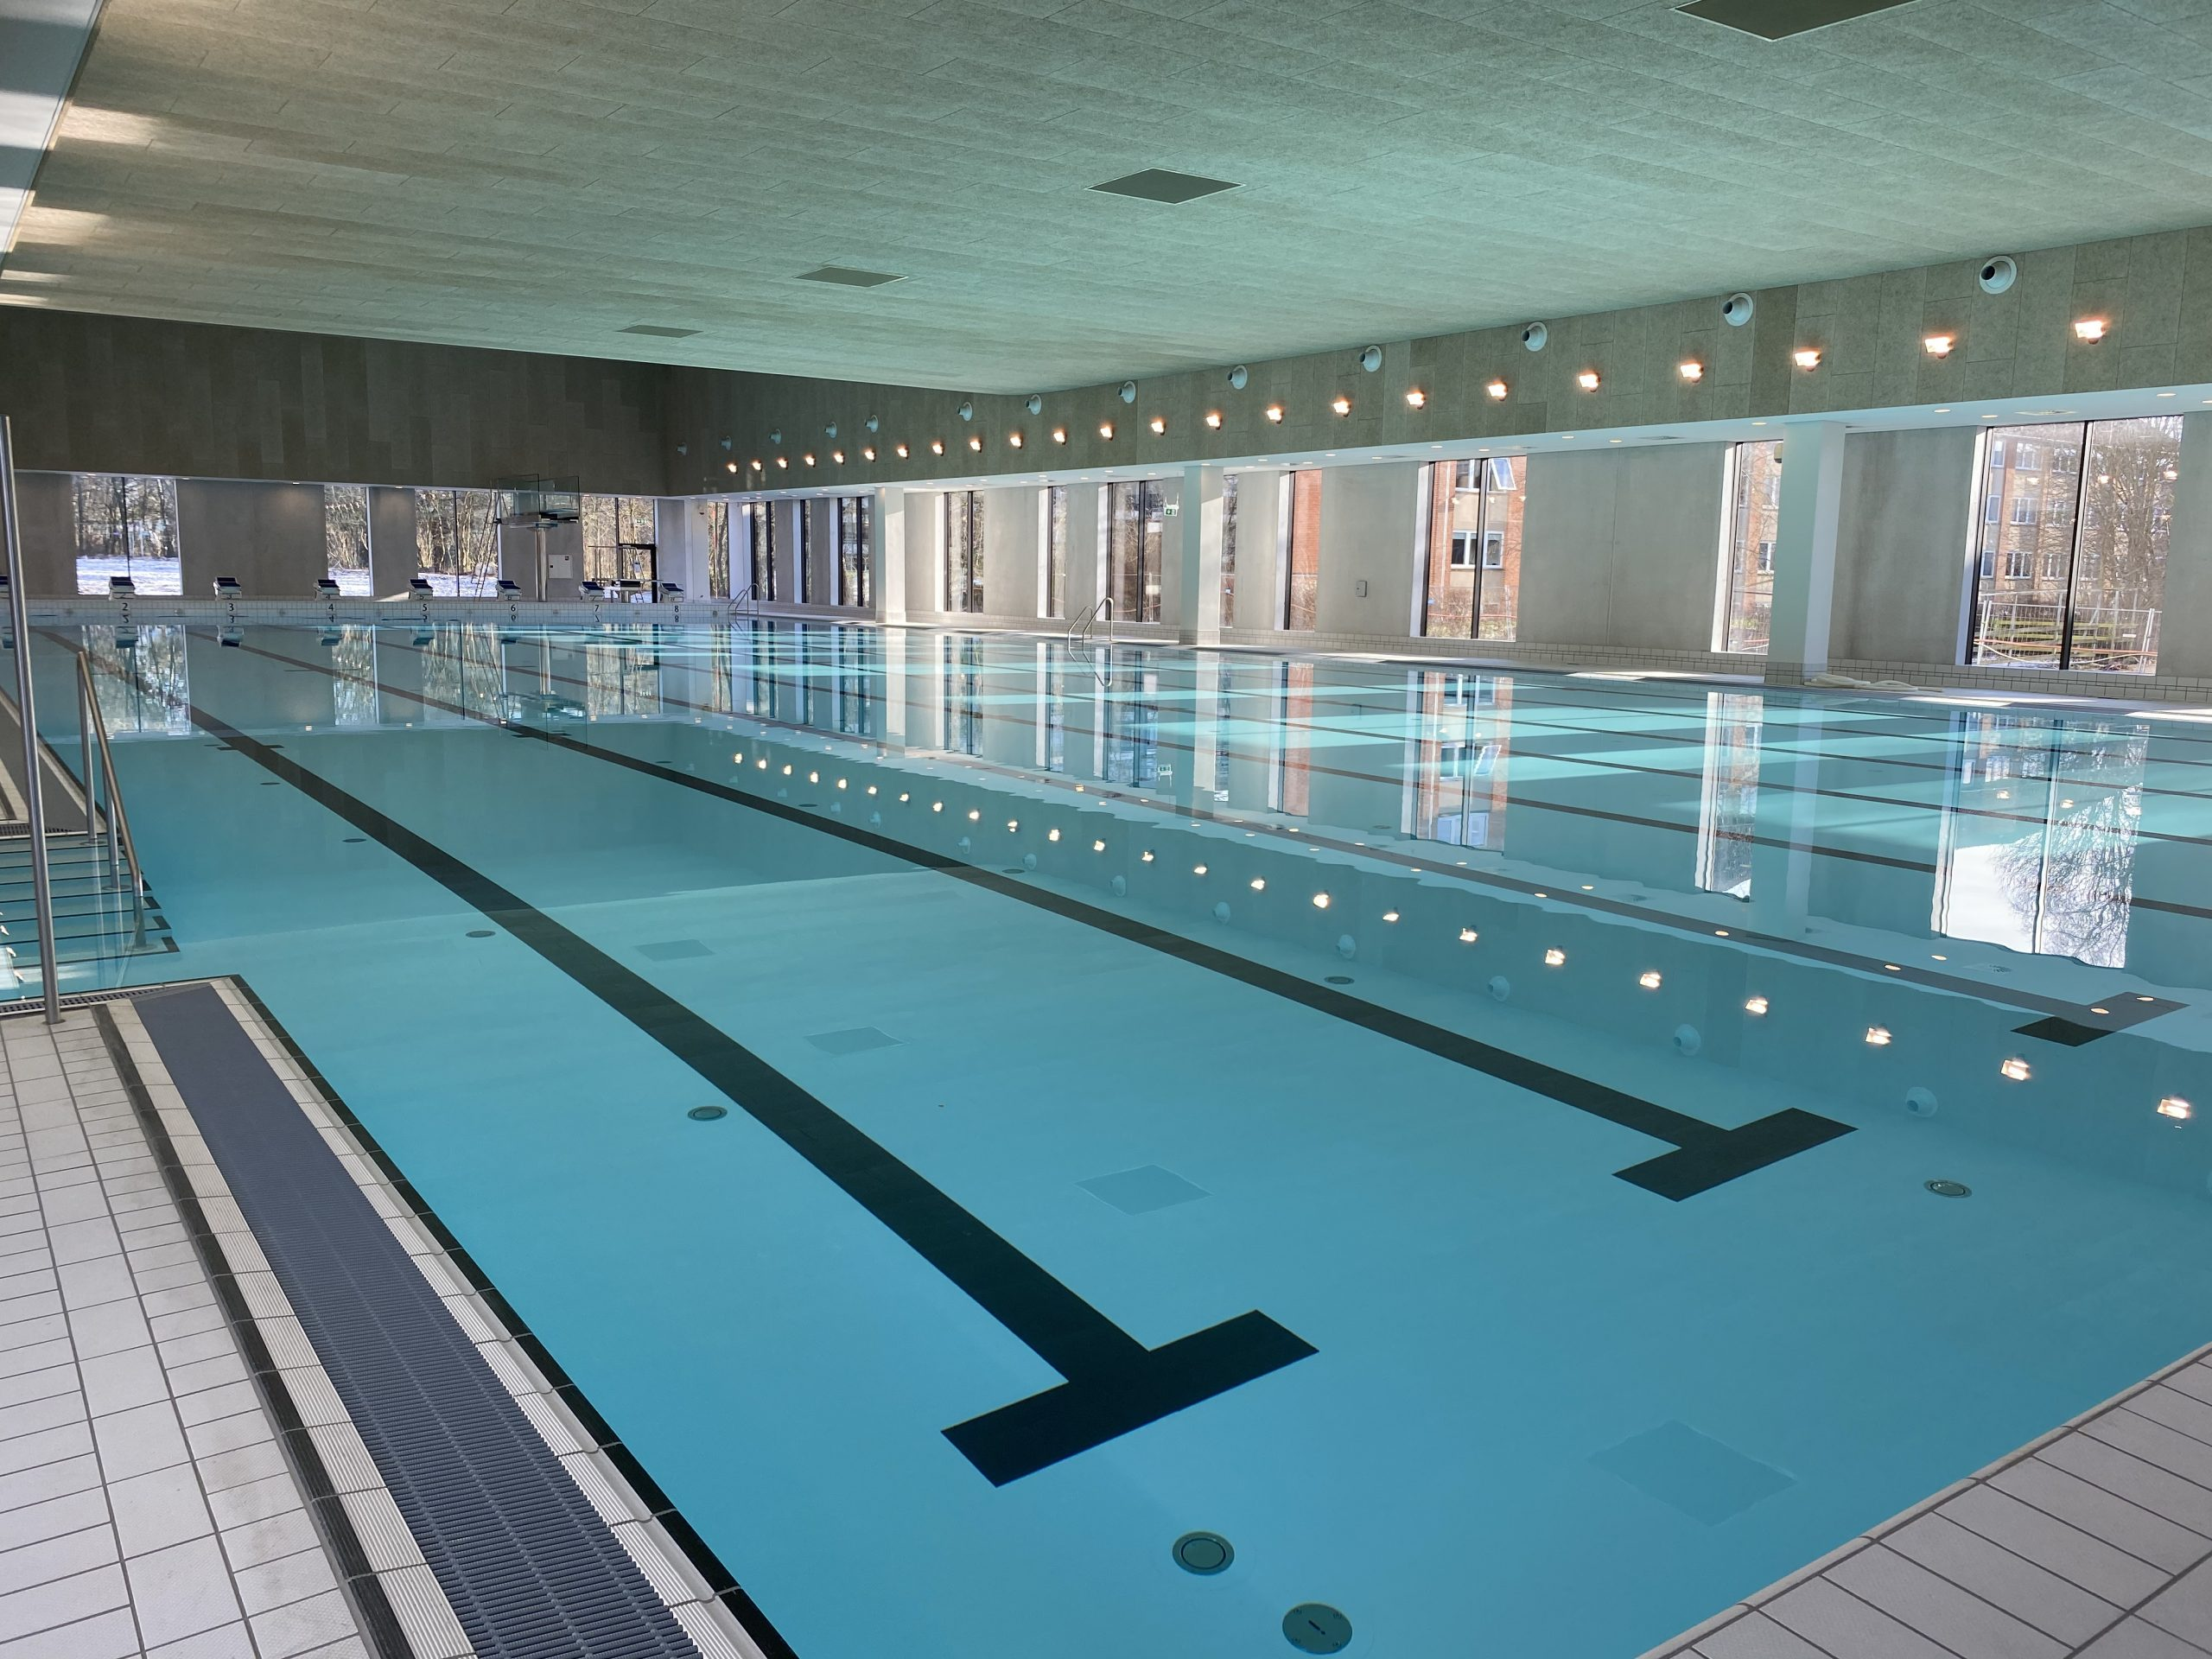 50 meters bassin, Roskilde Badet, Renovering 2020, Dansk Folie